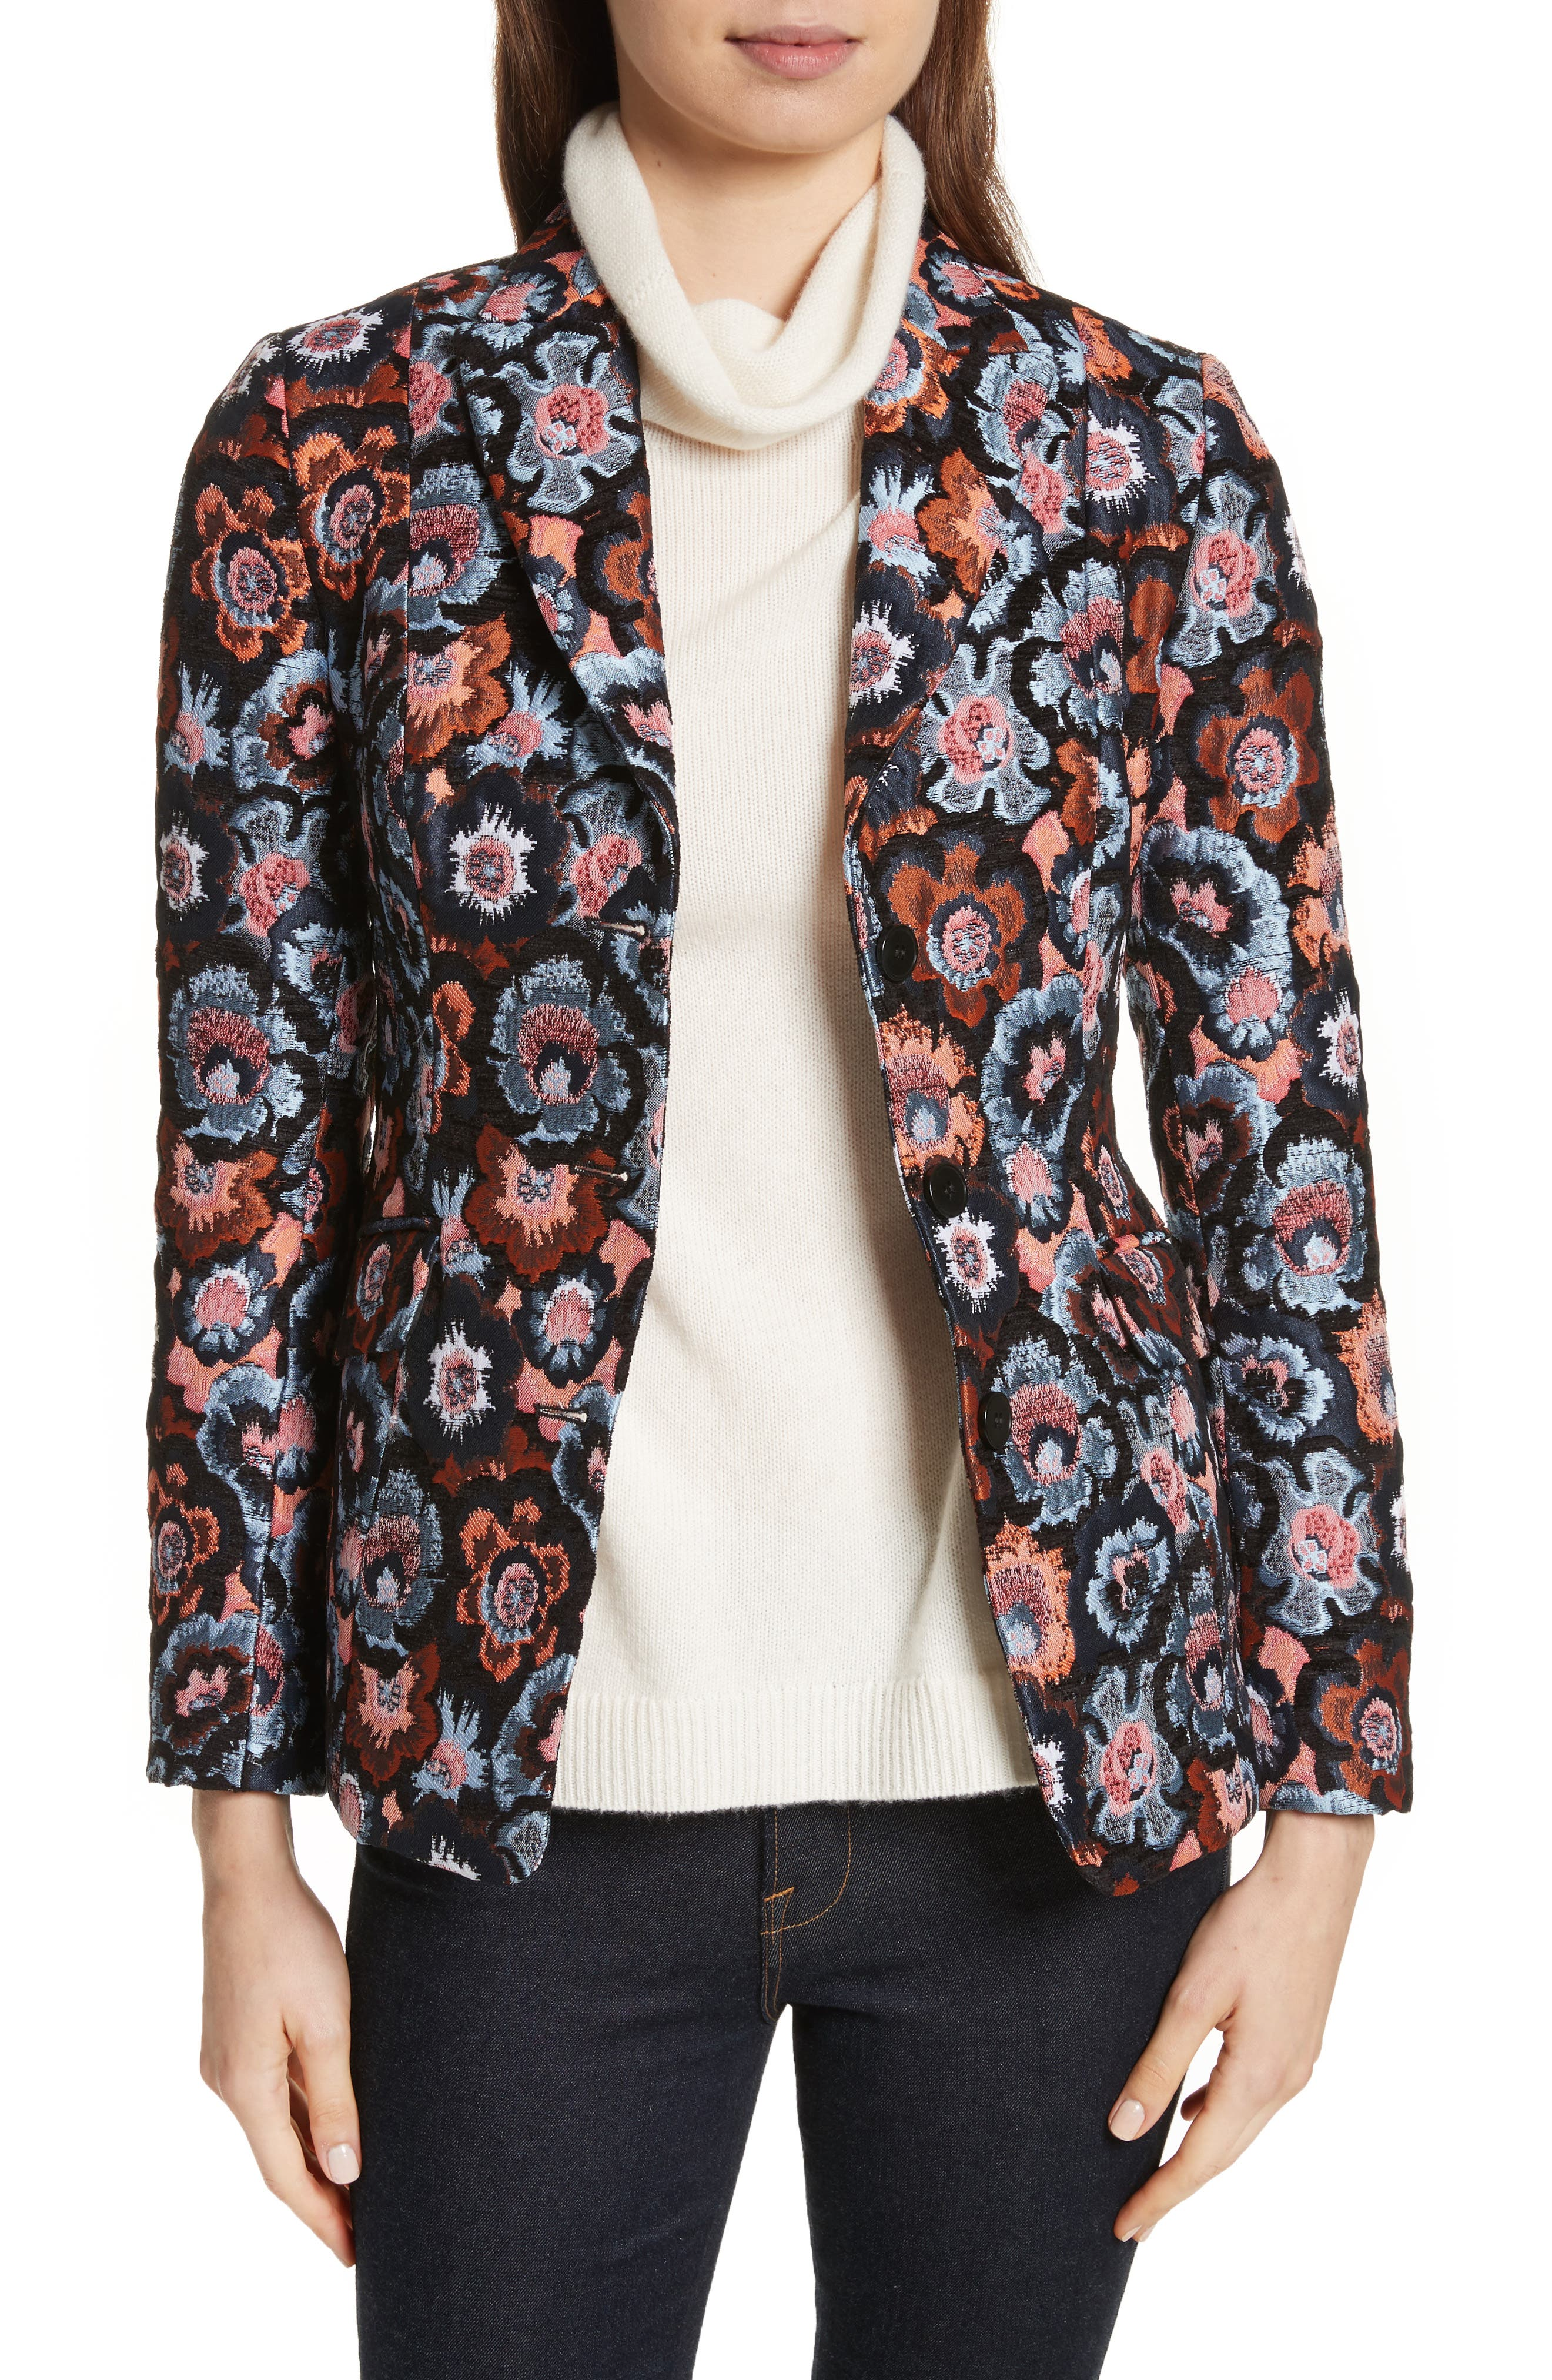 Theory Floral Jacquard Riding Jacket